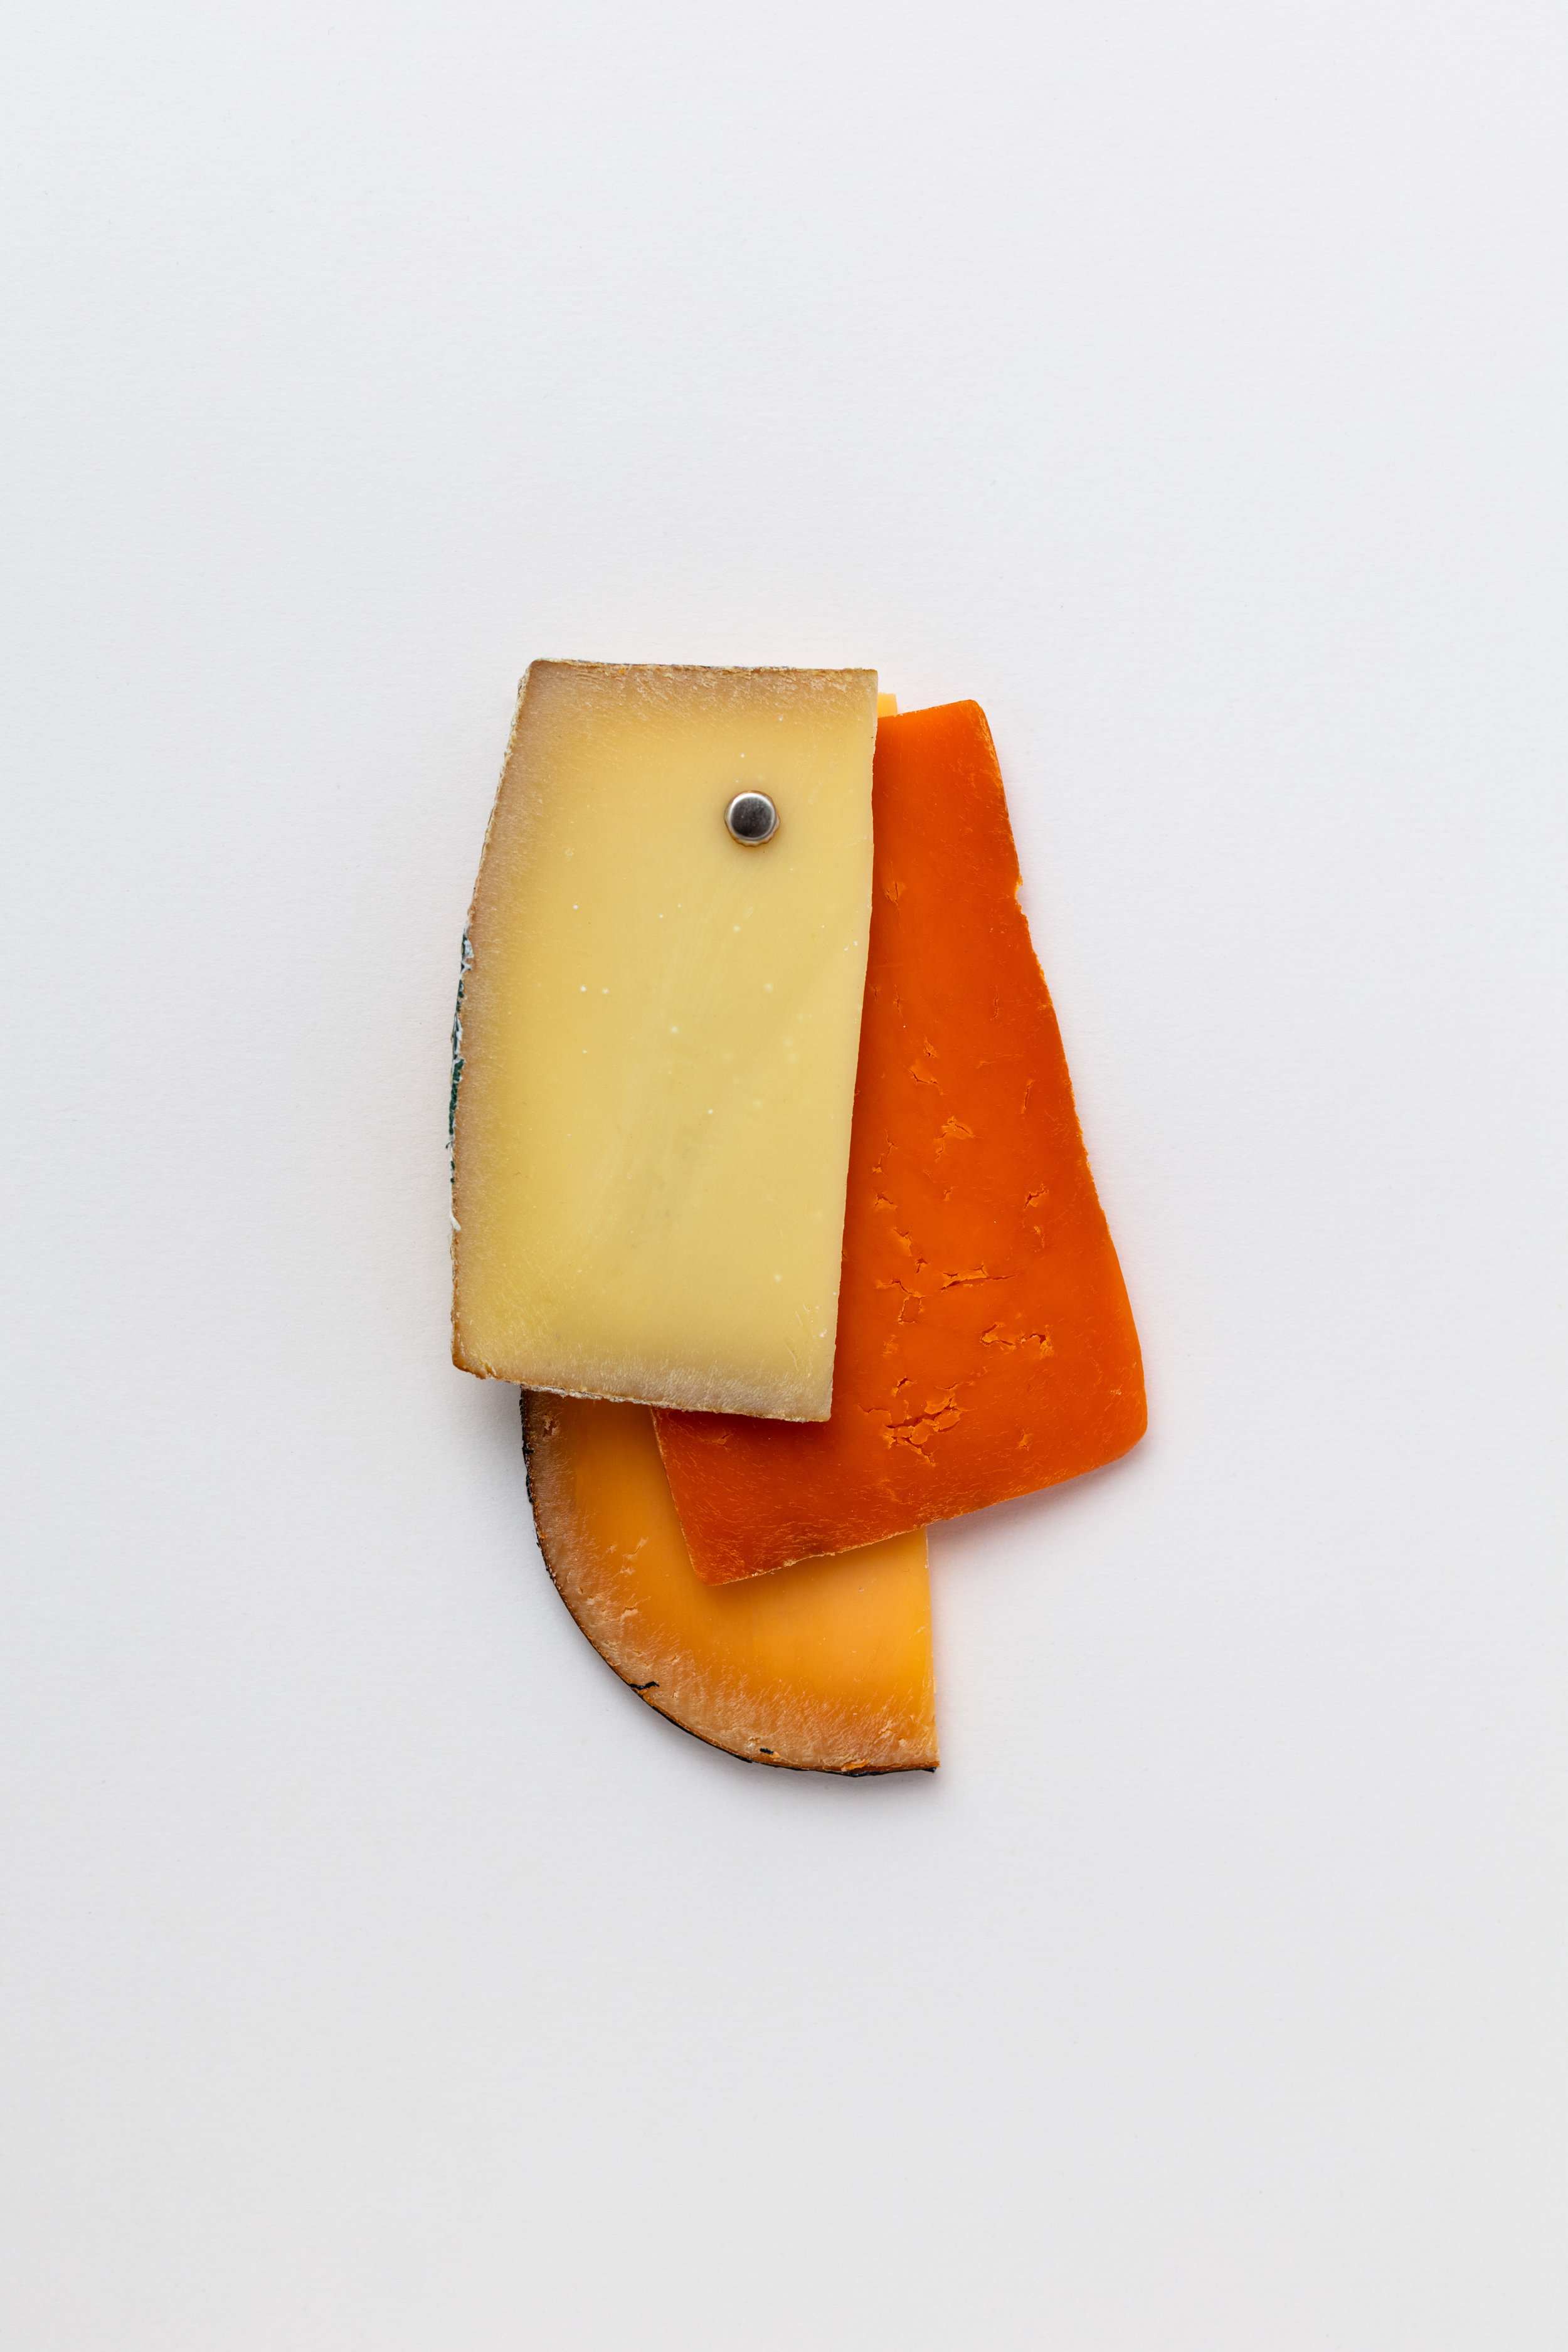 NP-CW-Cheese10.jpg